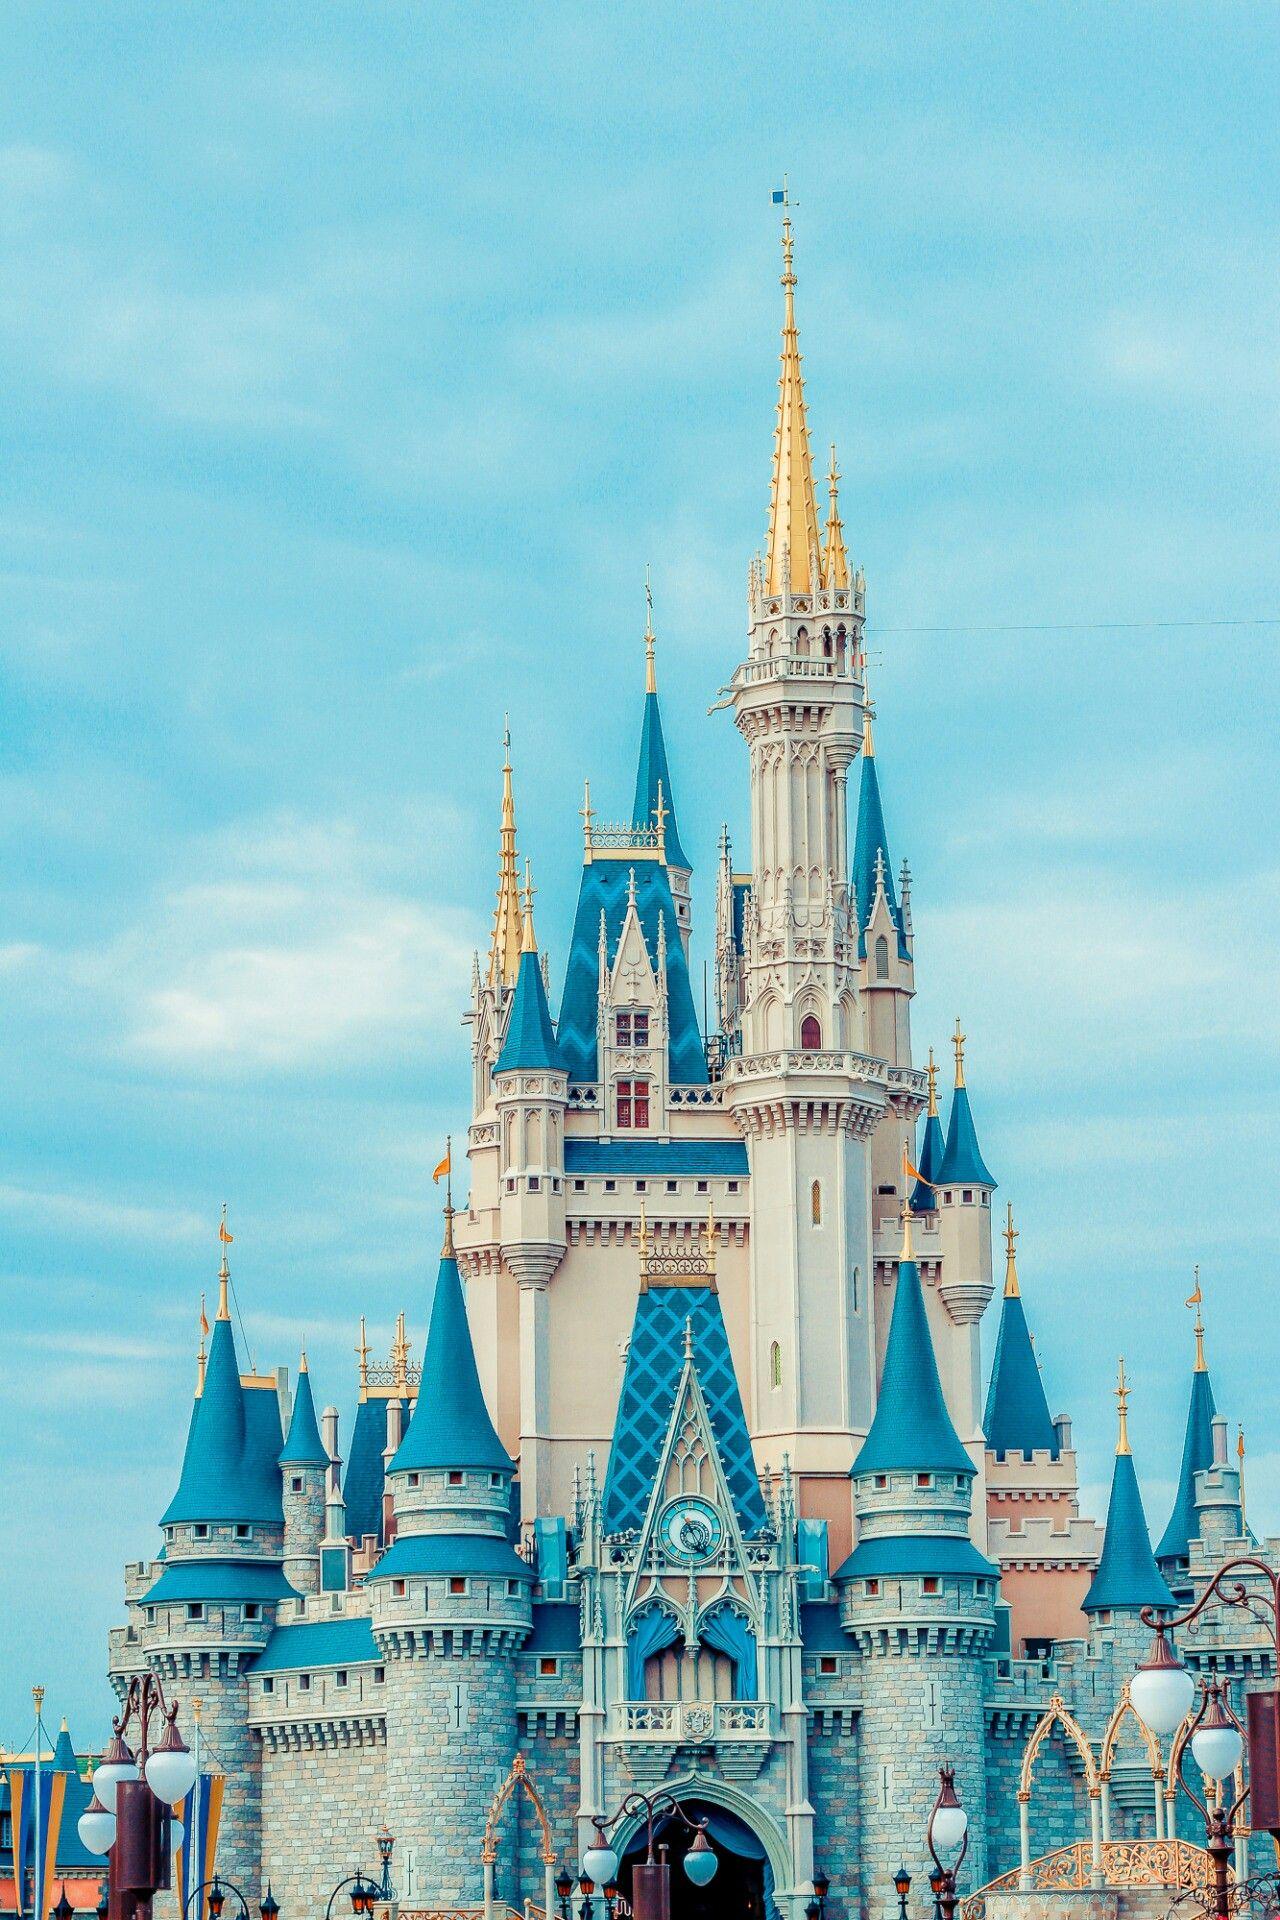 Disney Castle Disney World Pictures Disney Art Disney Wallpaper